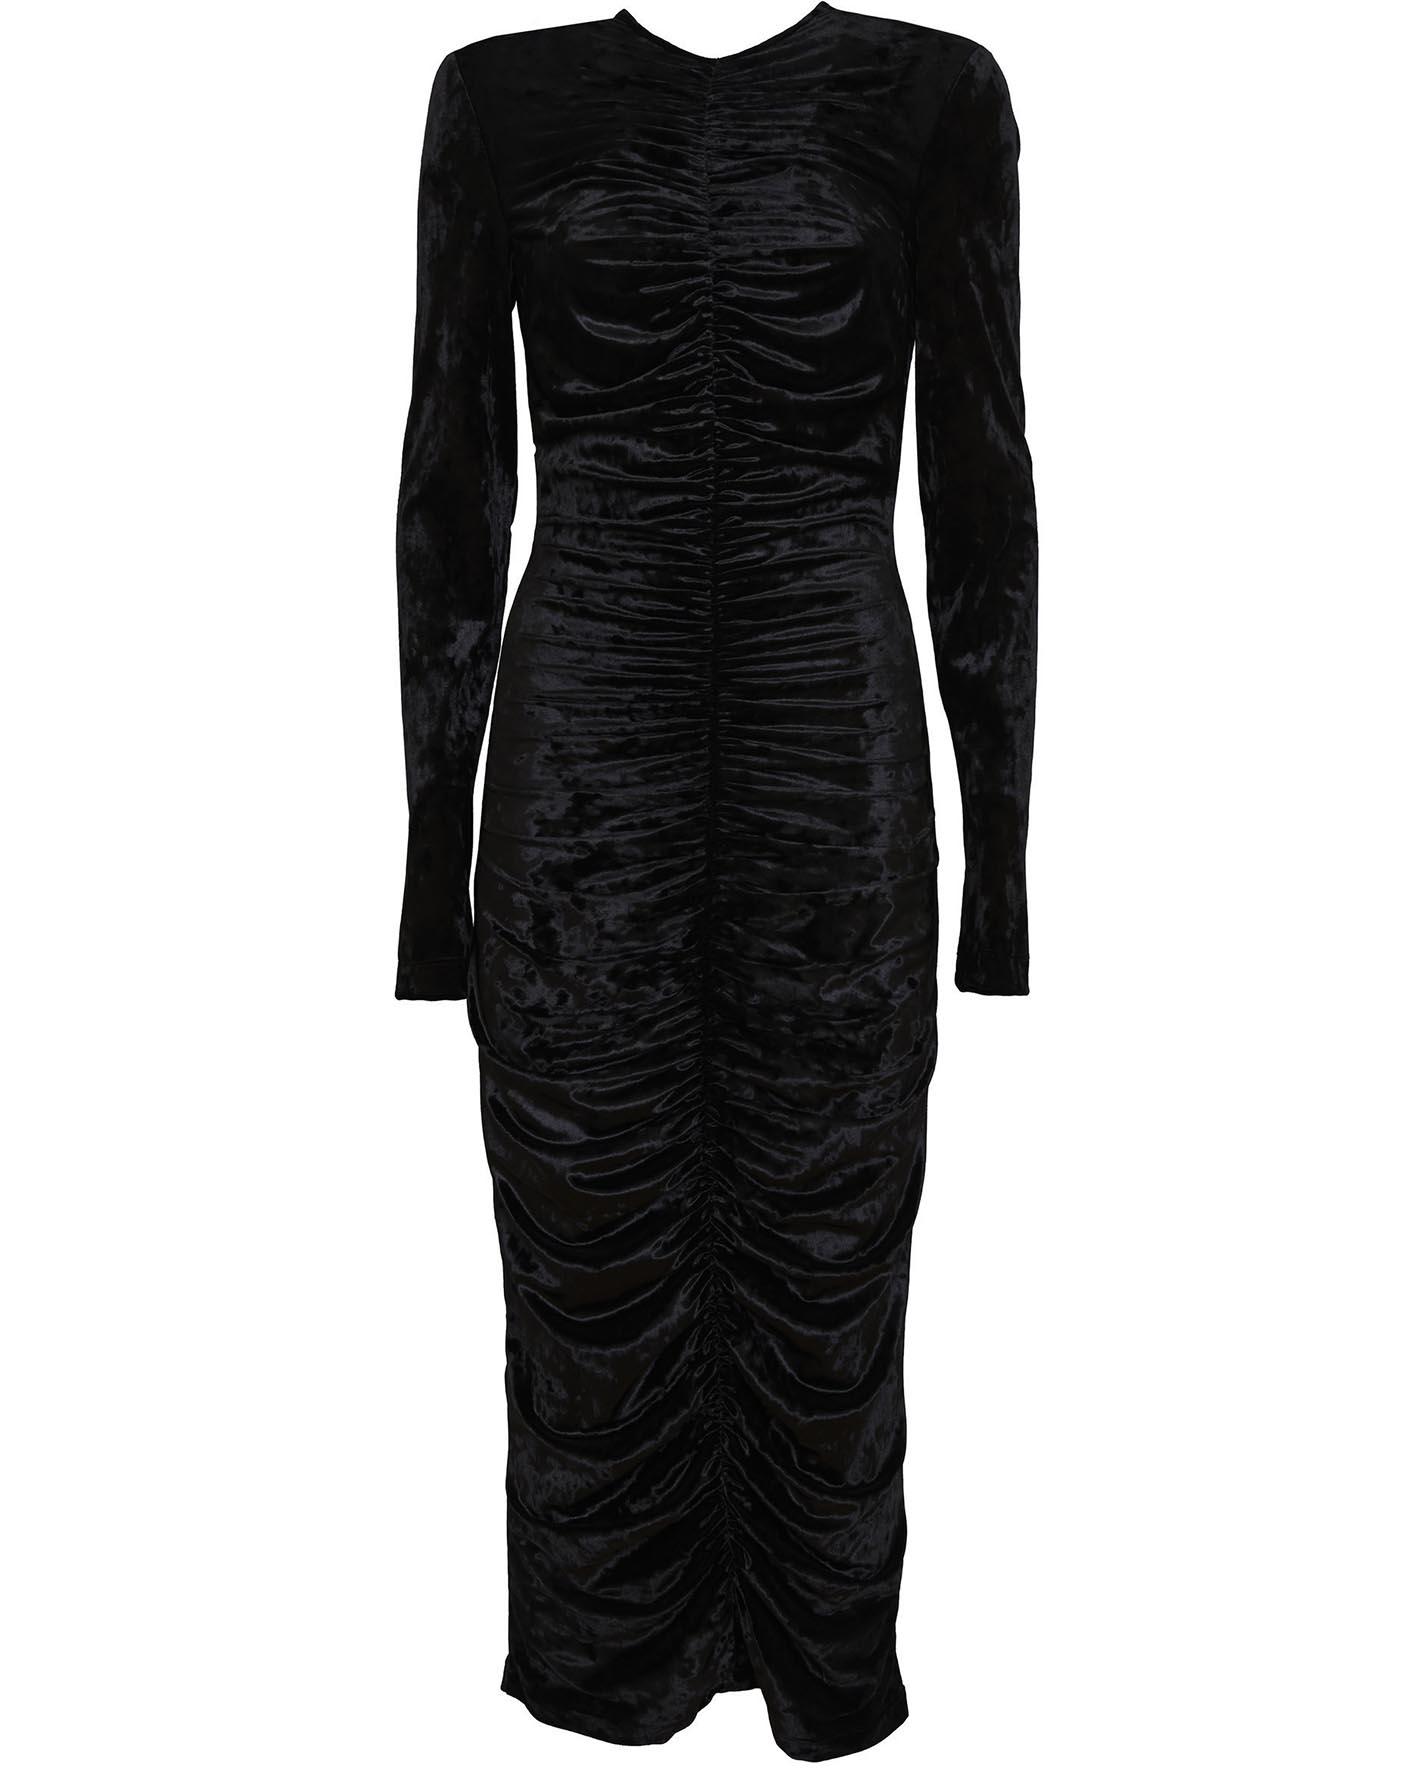 sara-battaglia-Velvet-Draping-dress